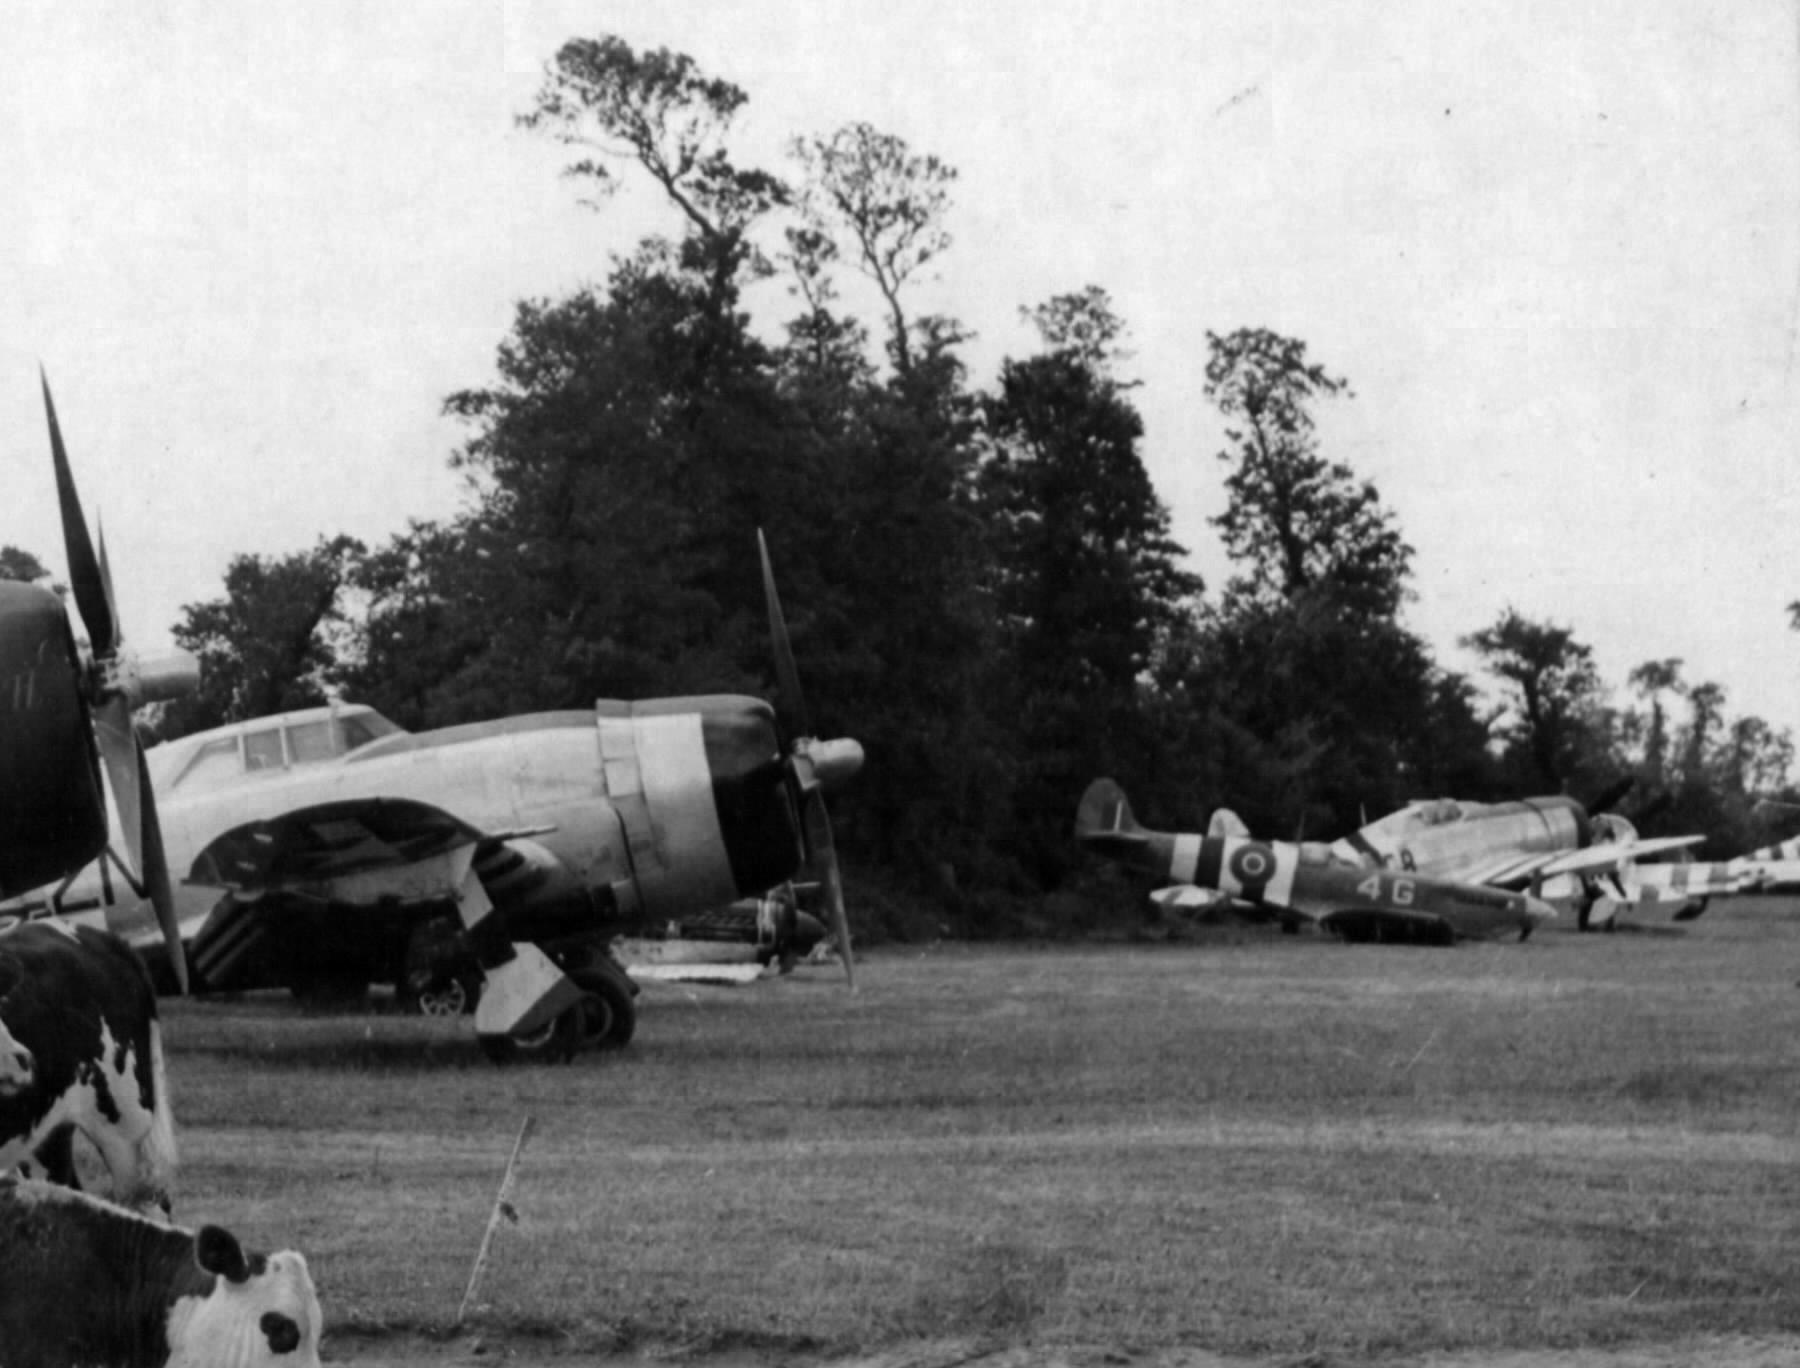 Spitfire MkVb USN VCS 7 4Q Normandy Airfield late 1944 02